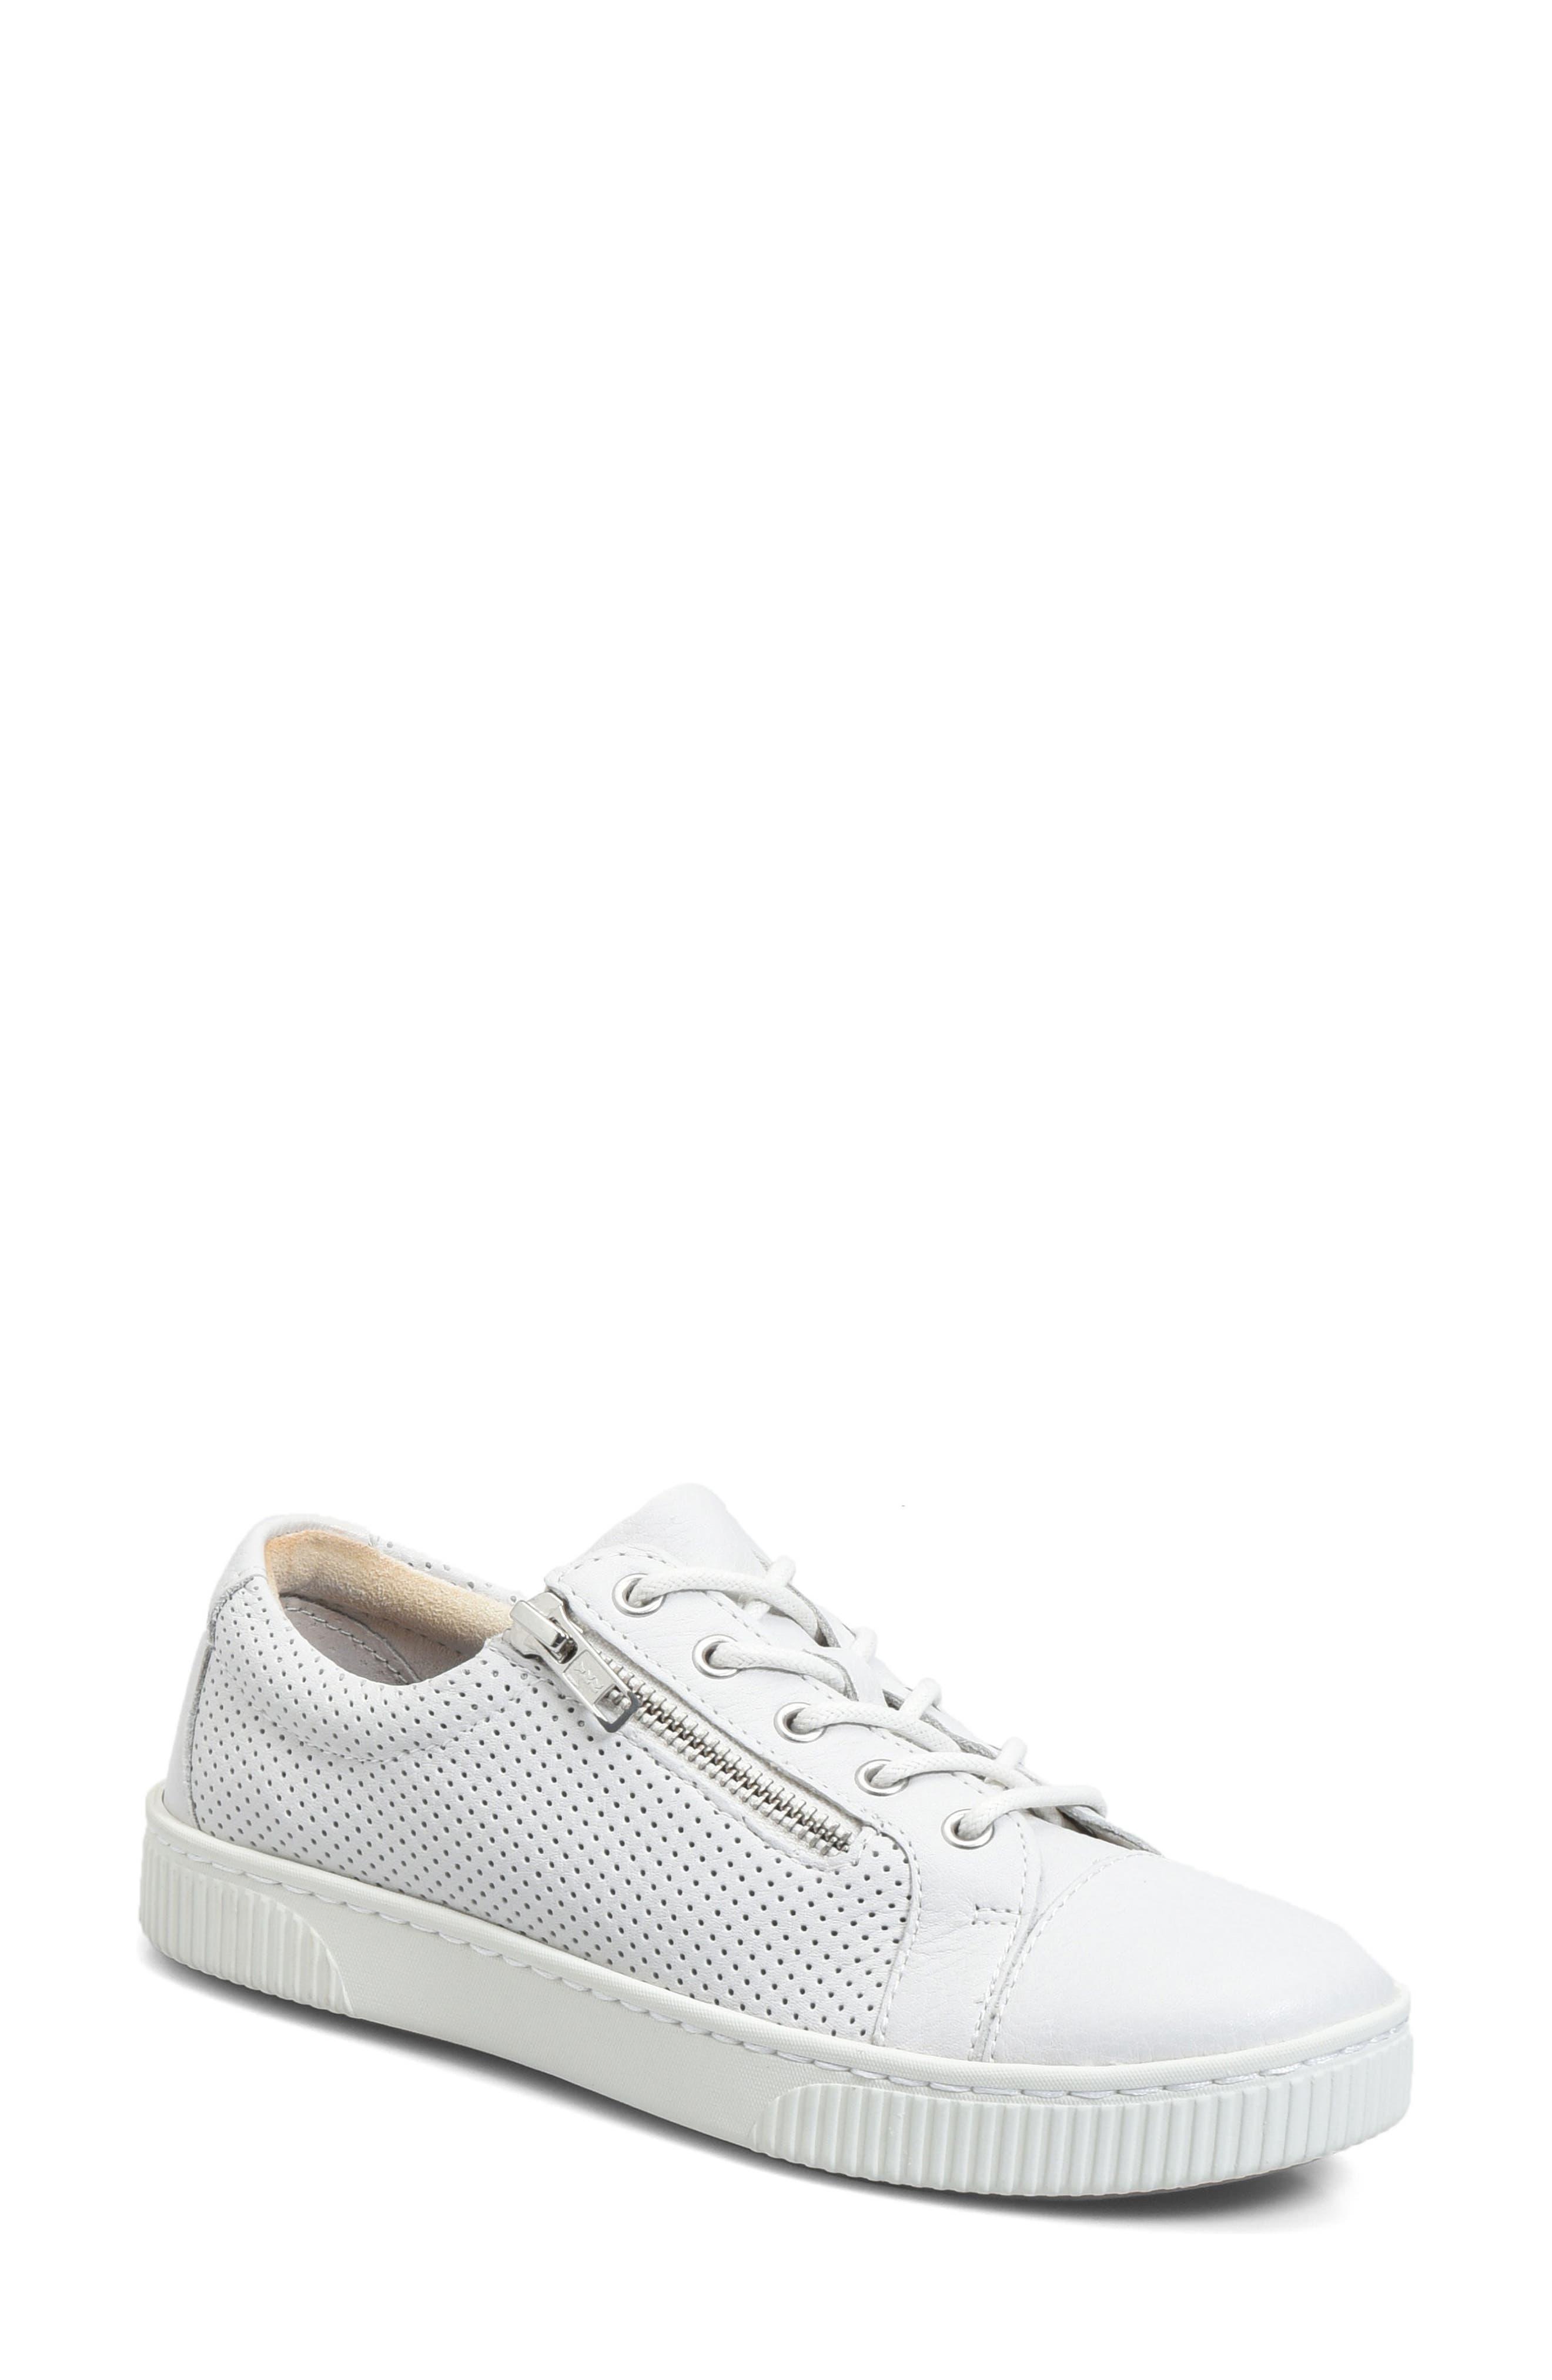 B?rn Tamara Perforated Sneaker- White